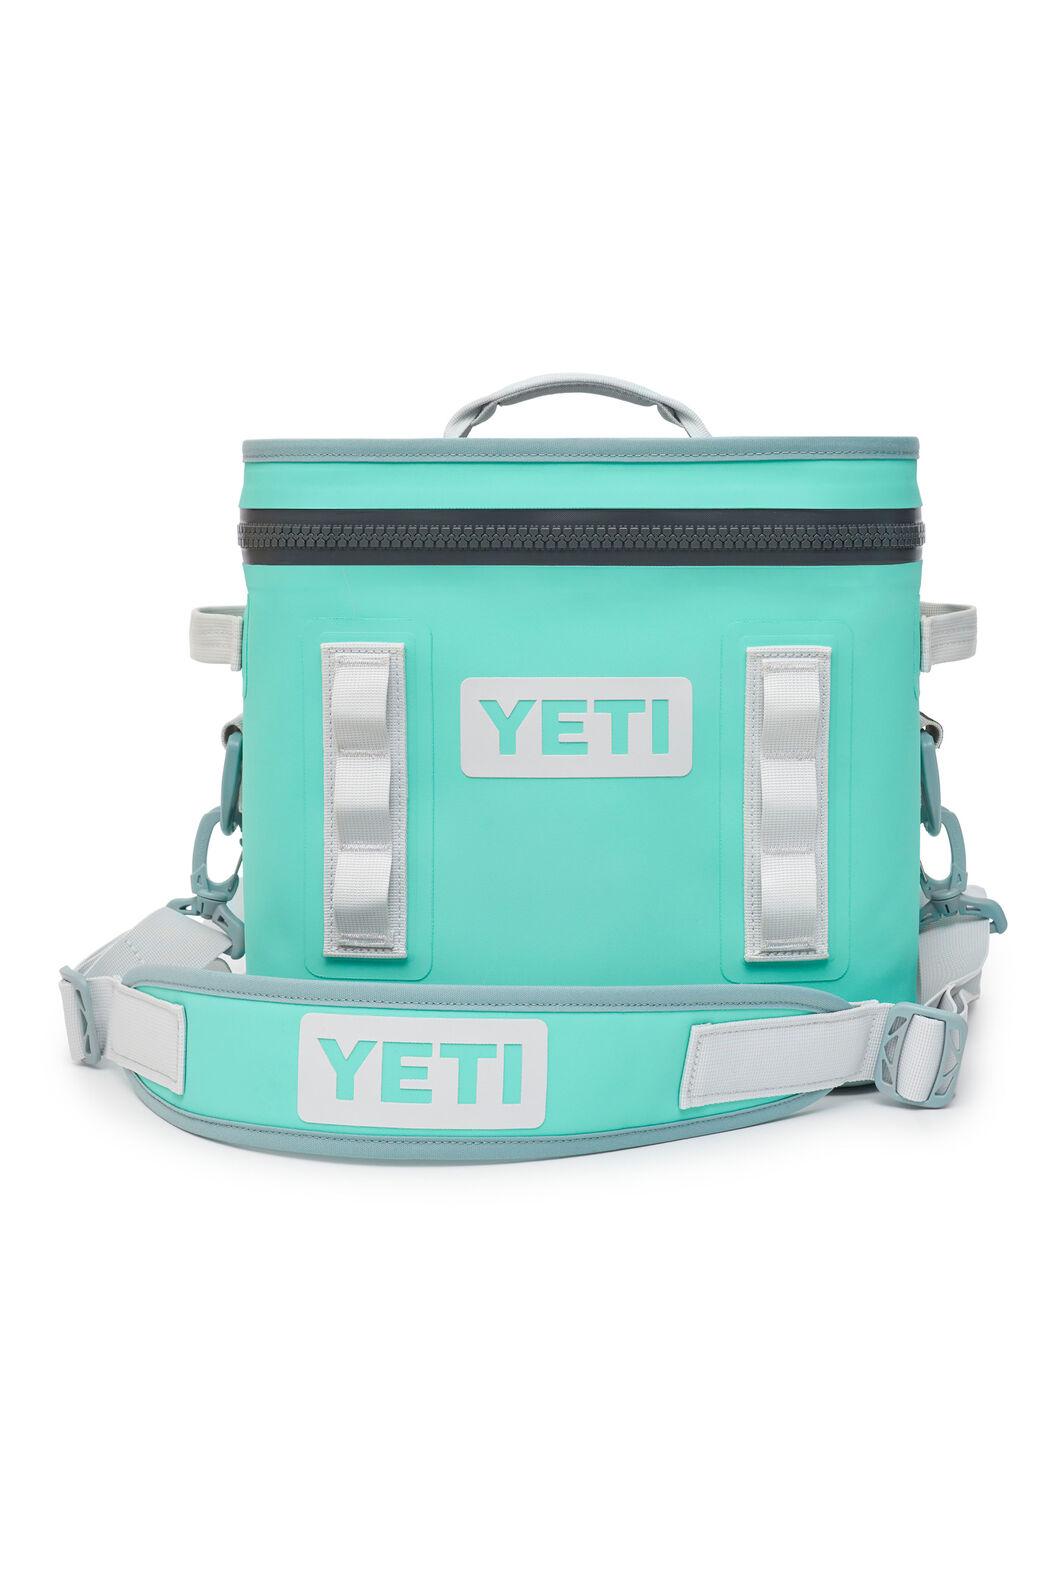 YETI® Hopper Flip 12 Soft Cooler, Aquifer Blue, hi-res